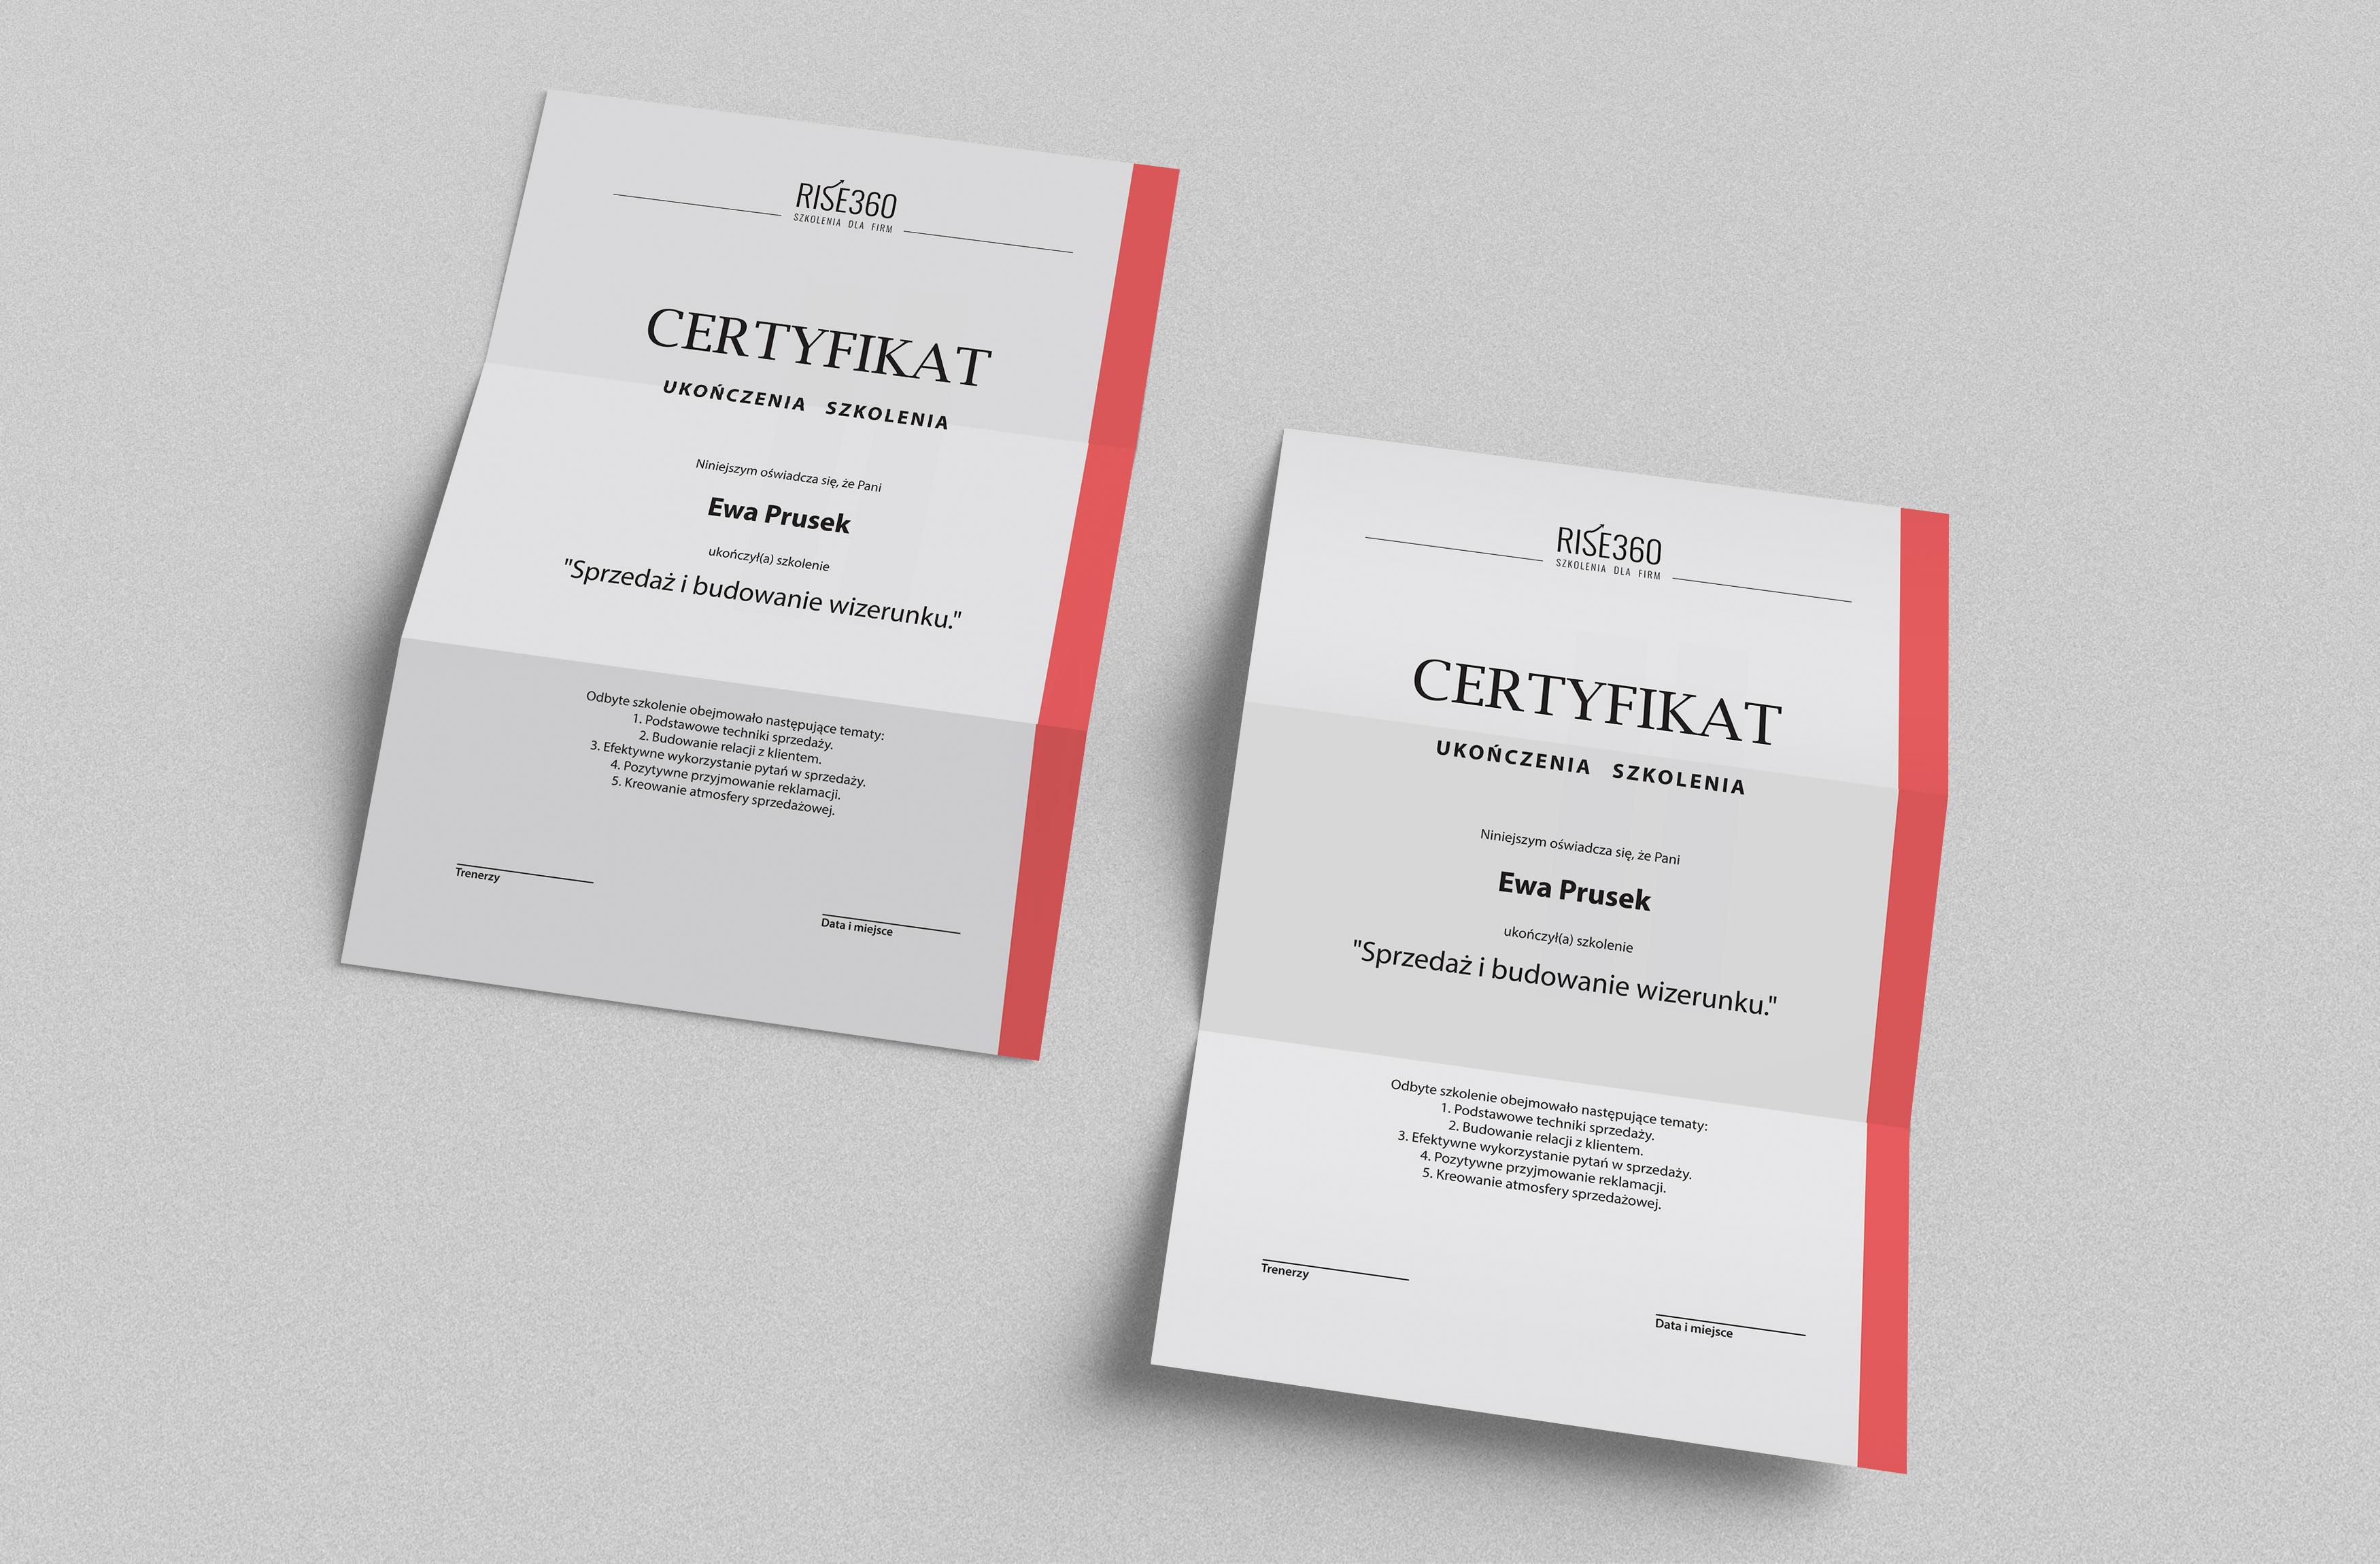 certyfikaty-rise360